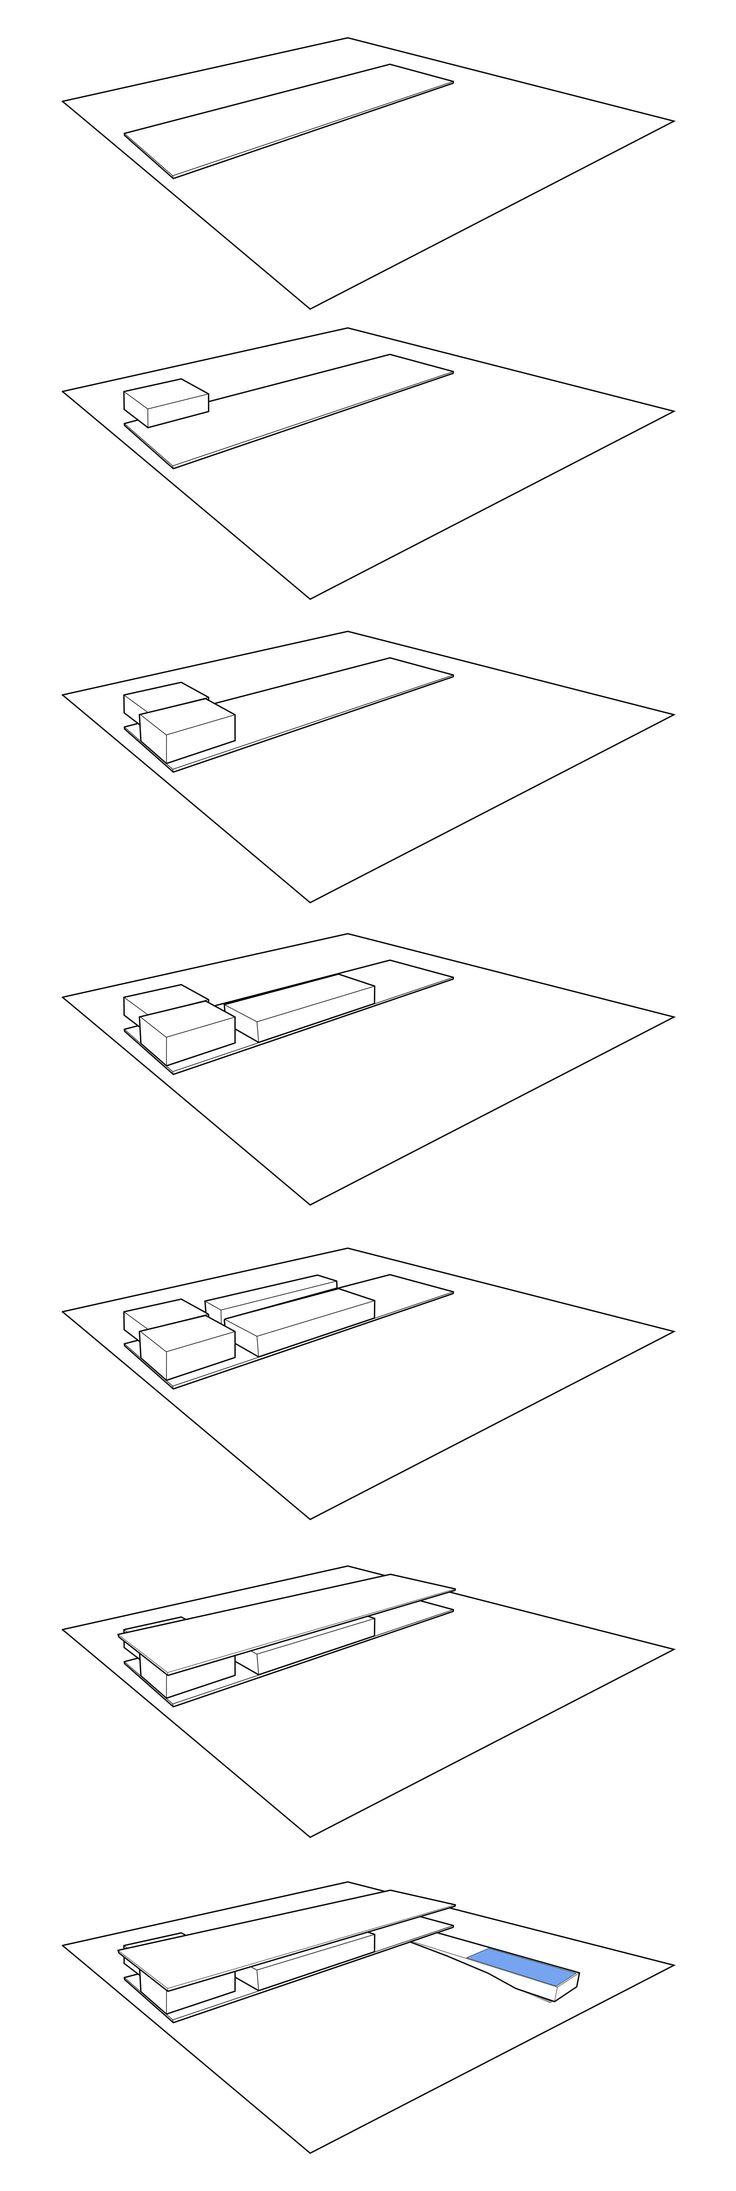 Open Layout House Concept By Studio Mk27 - Gallery of redux house studio mk27 marcio kogan samanta cafardo 50